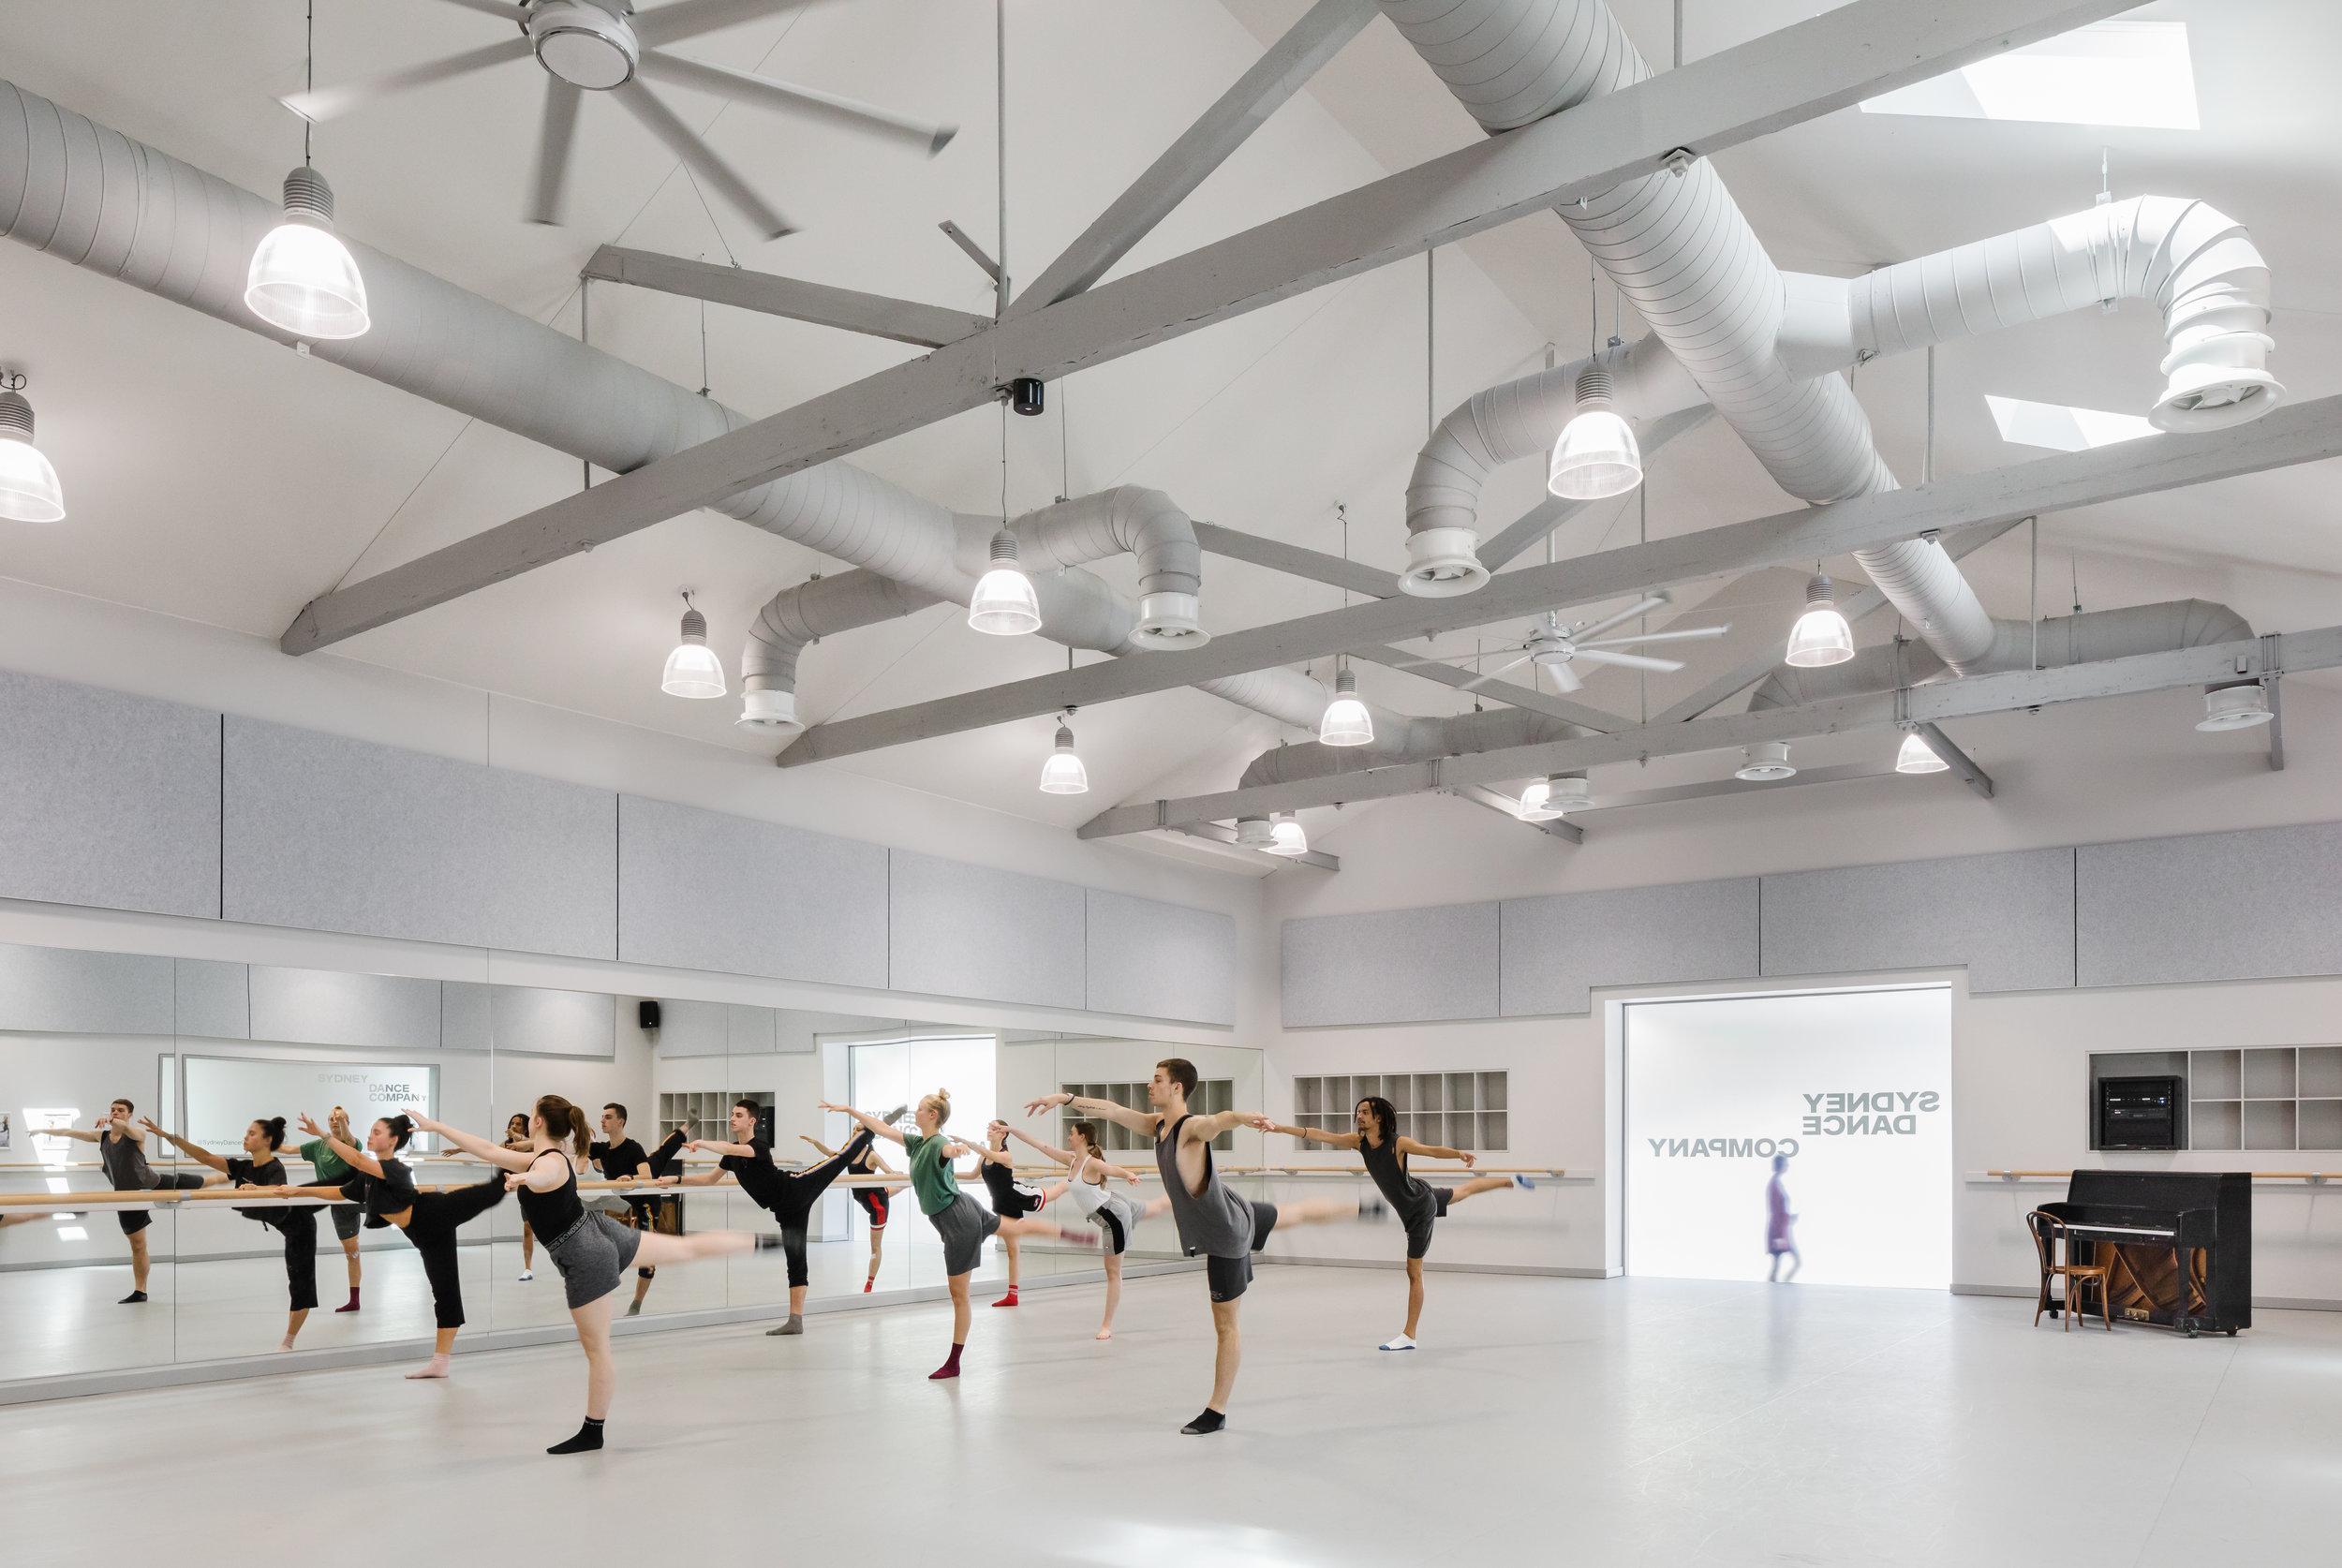 3114-interior_Sydney Dance Company Rehearsal Studios_ Dunn+HIllam Architects_Kat Lu photography_04.jpg